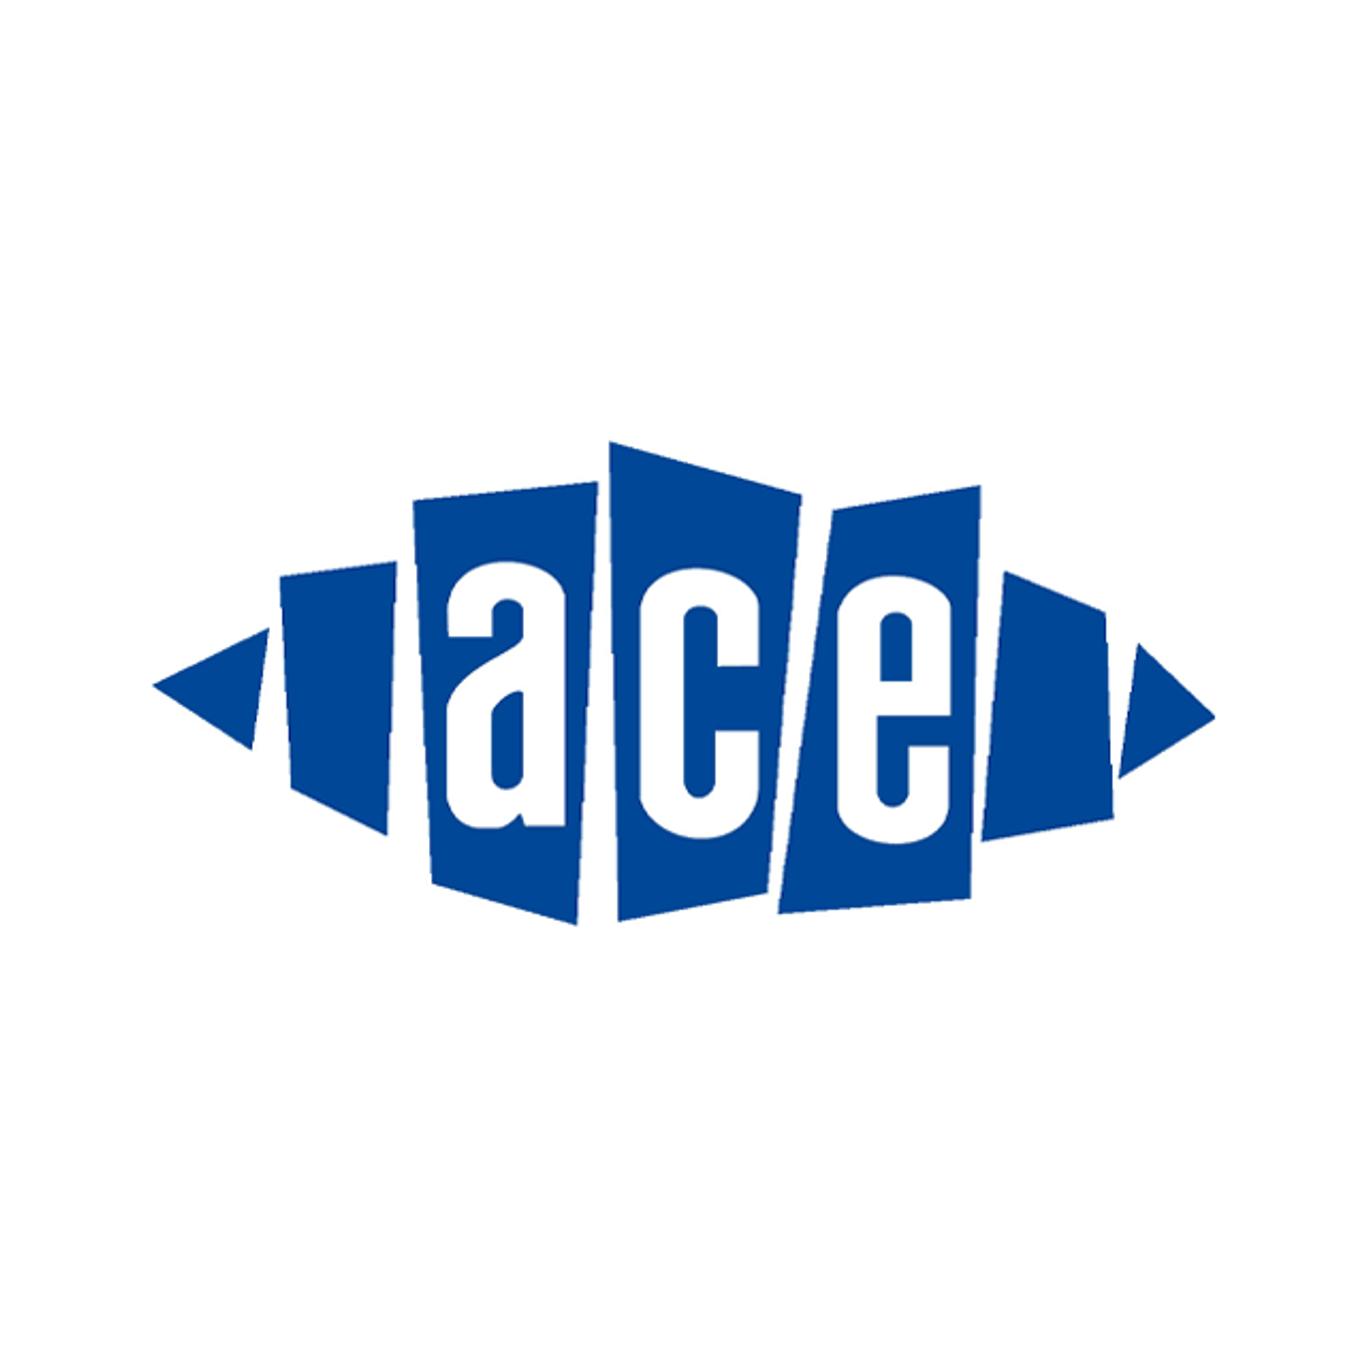 Ace Records Ltd